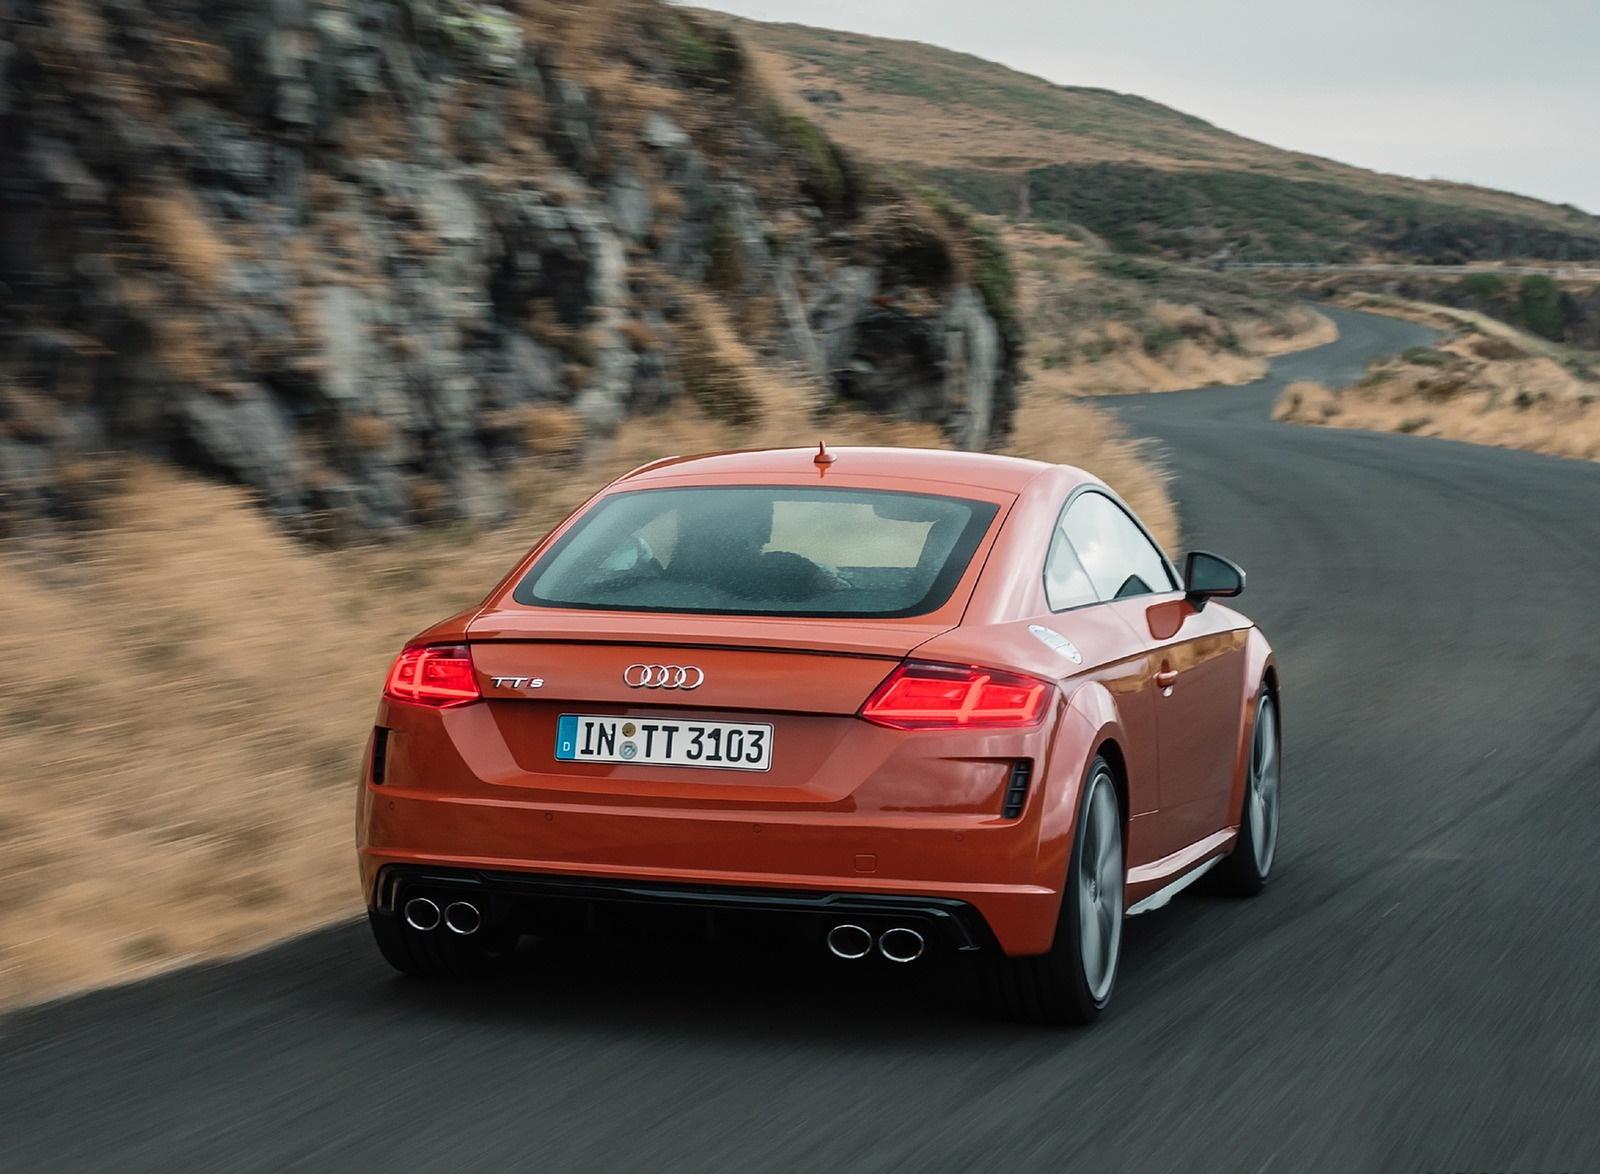 2019 Audi TTS Coupe (Color: Pulse Orange) Rear Wallpapers (11)